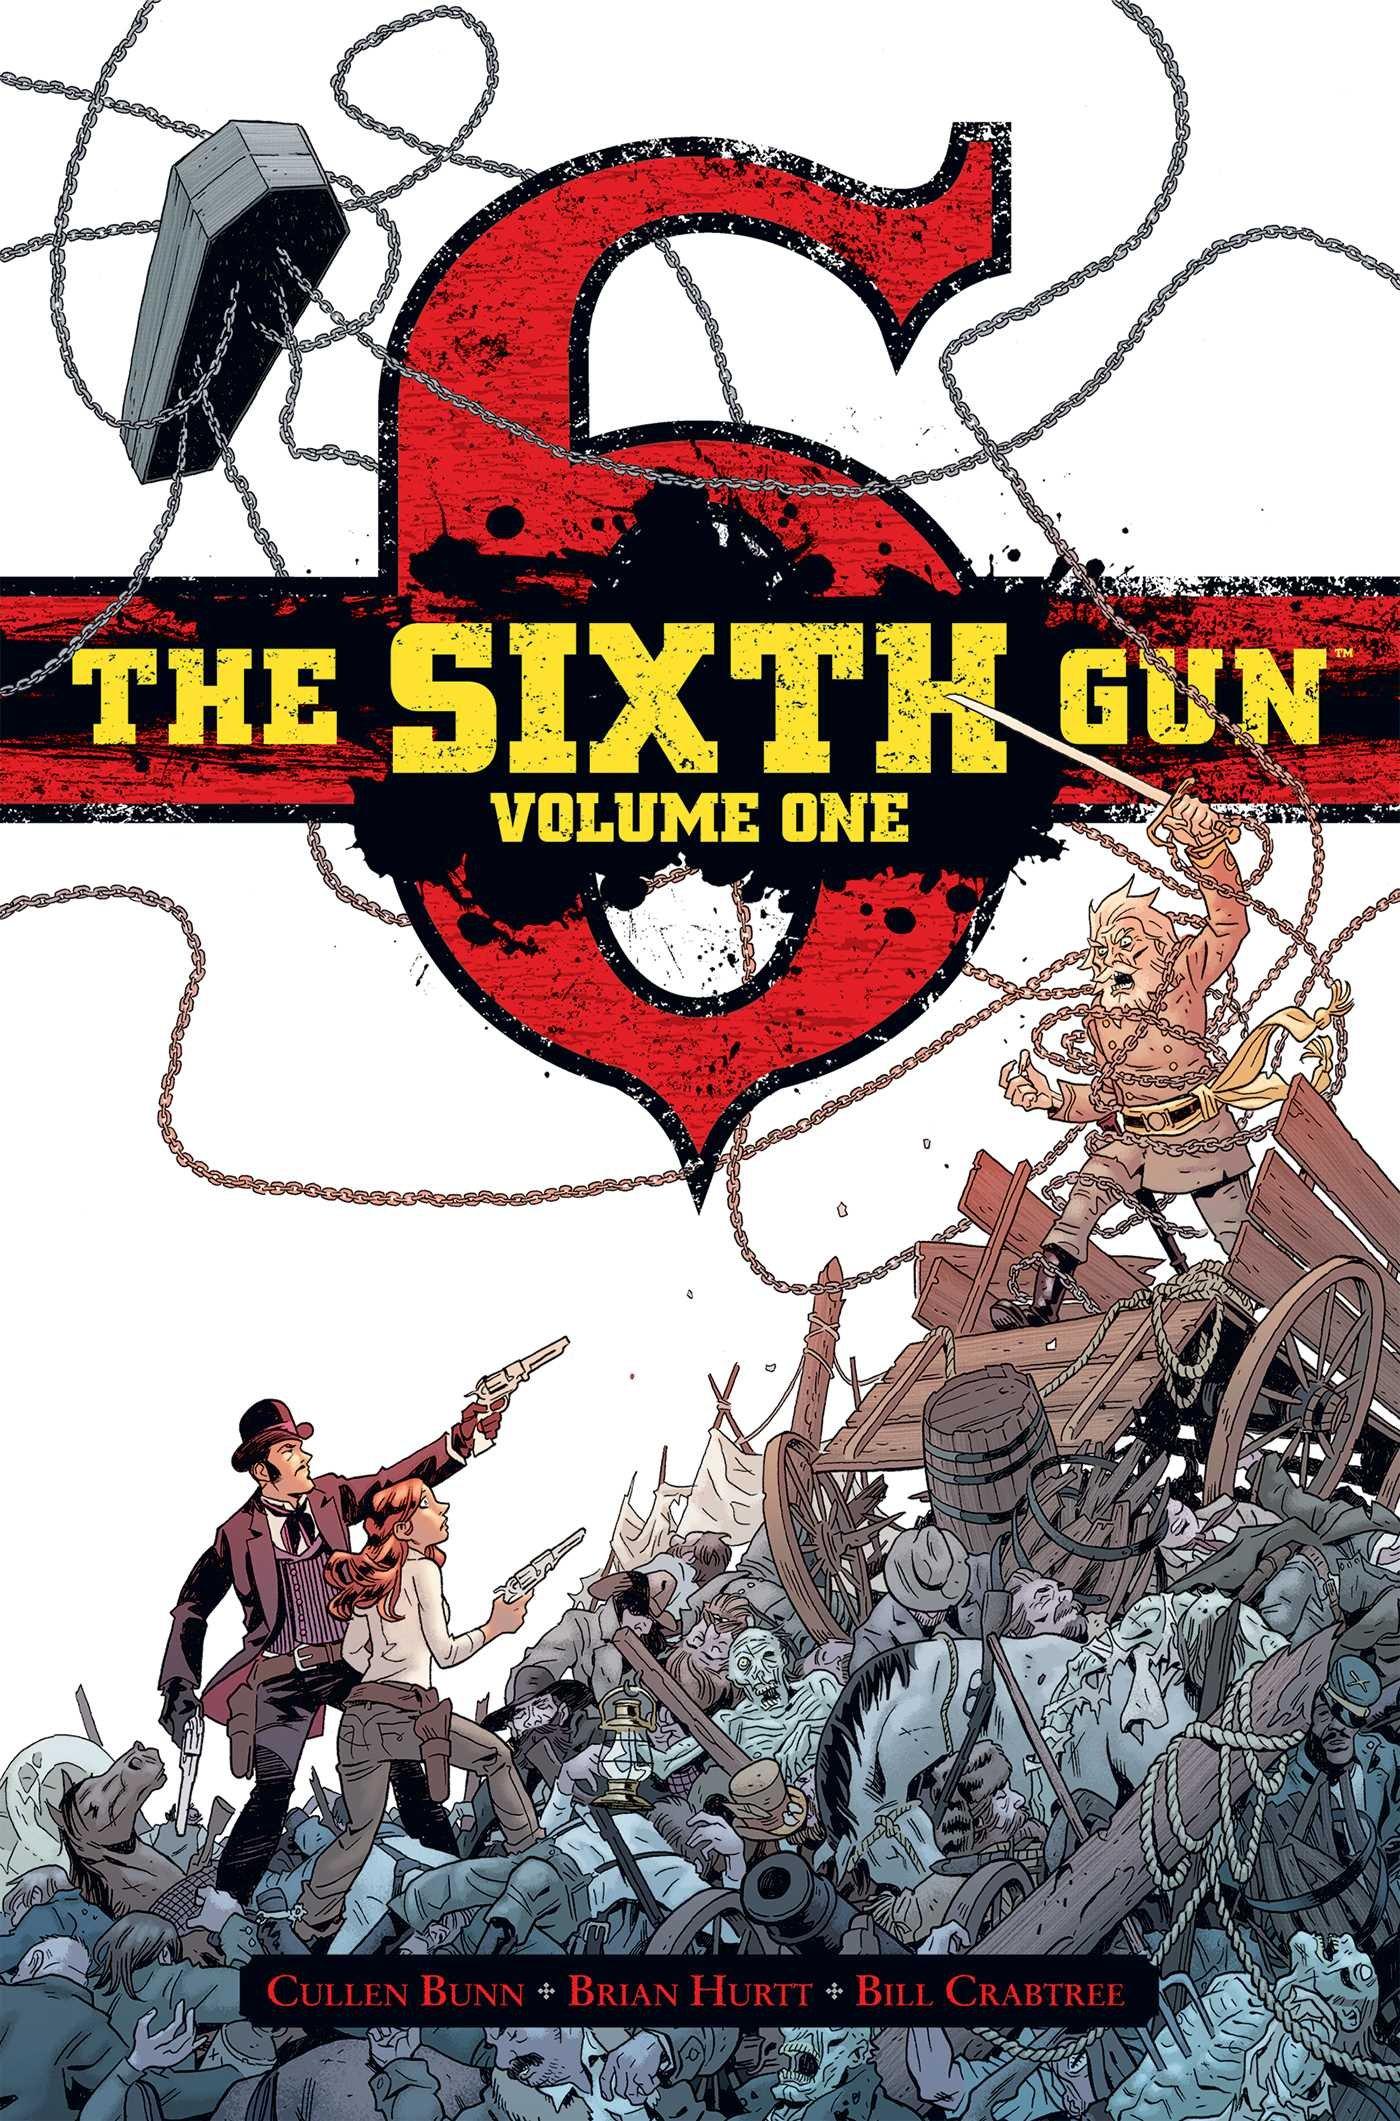 The Sixth Gun Vol. 1: Deluxe Edition